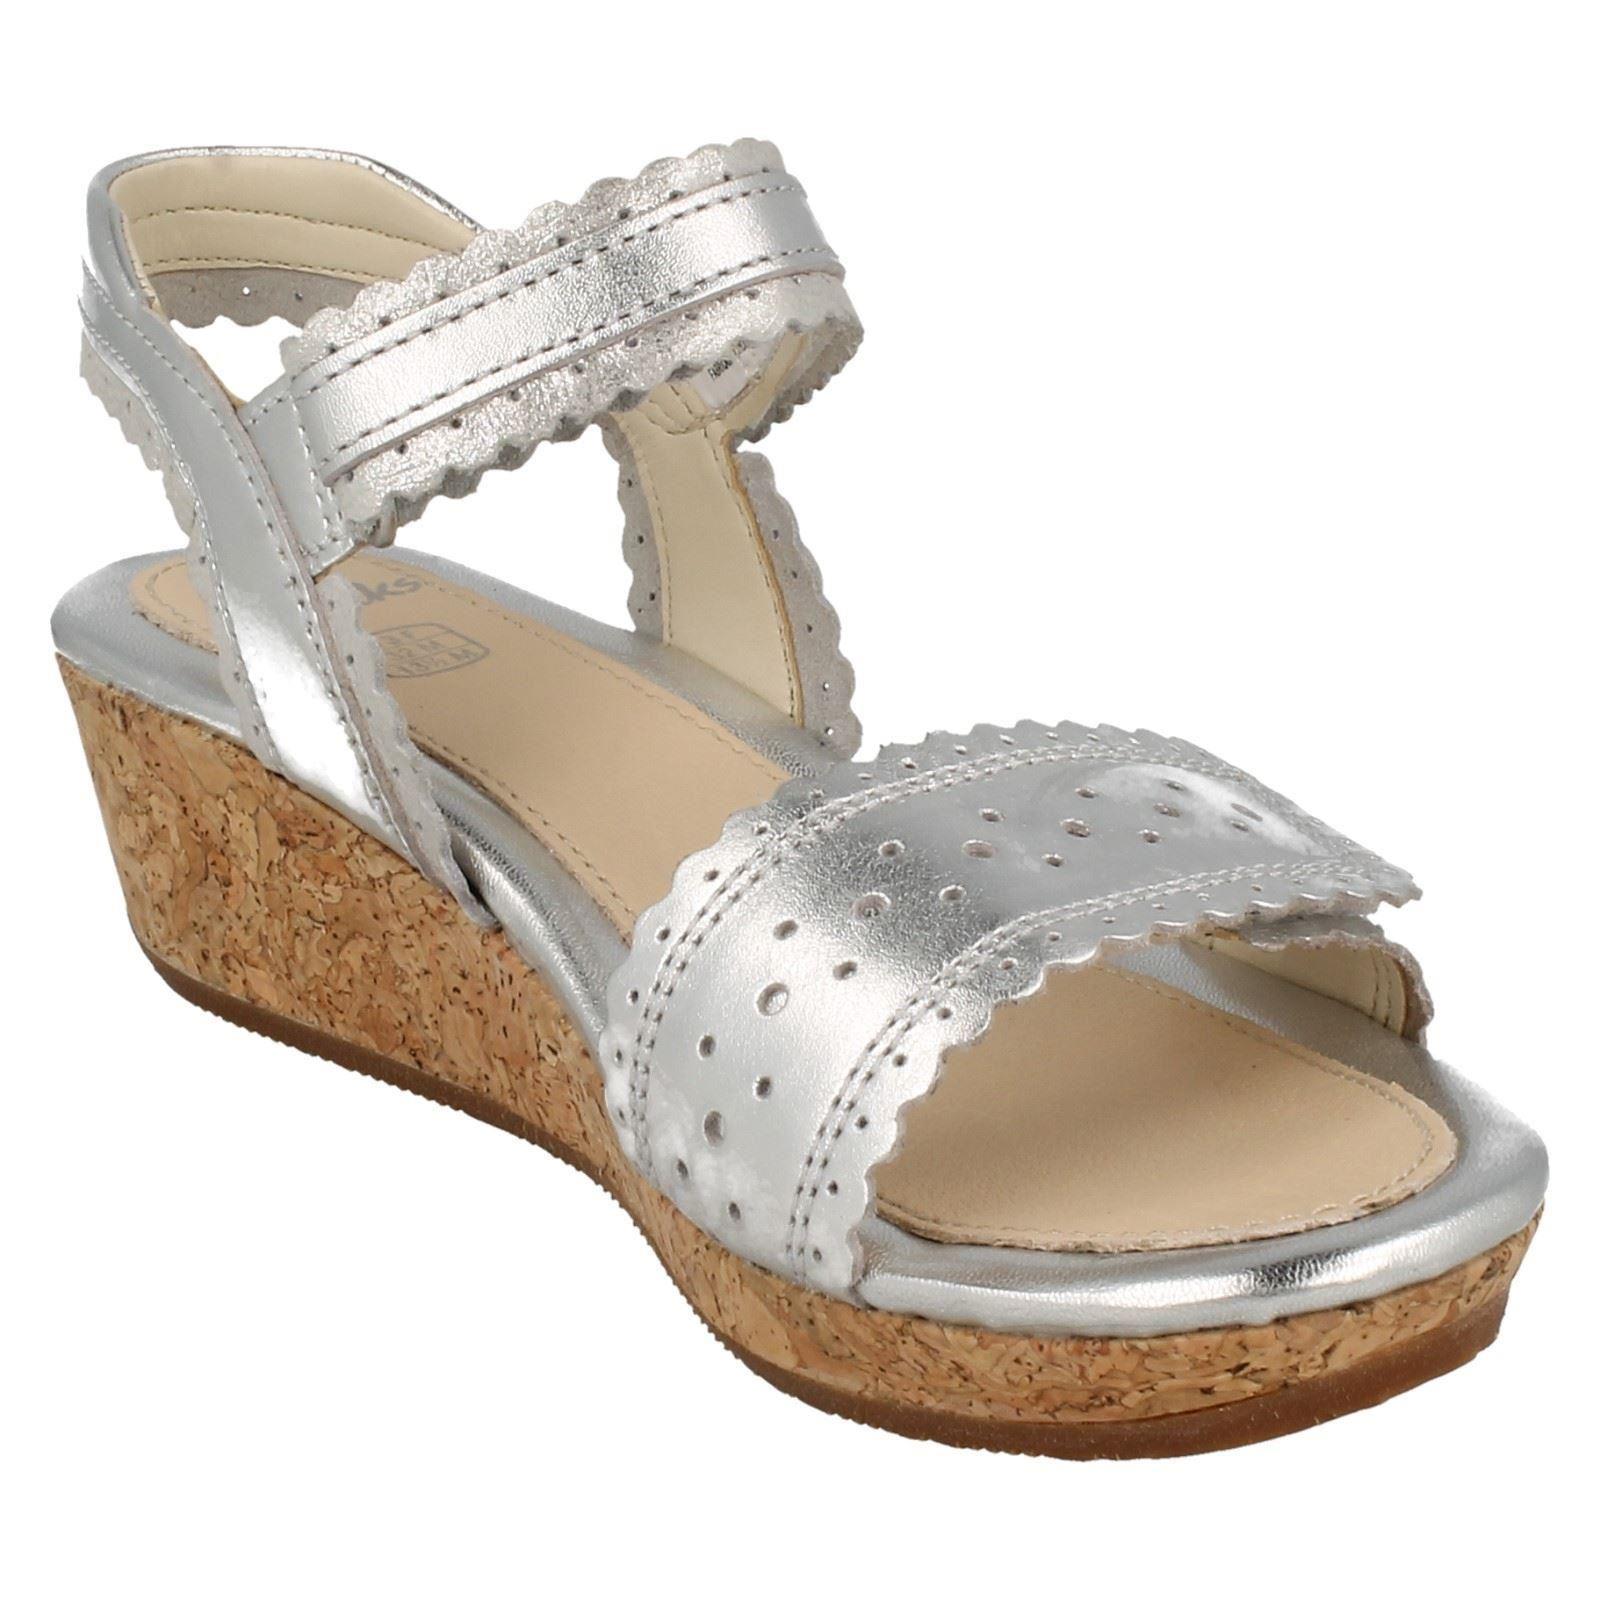 Details about Girls Clarks Harpy Myth Wedge Heel Summer Sandals